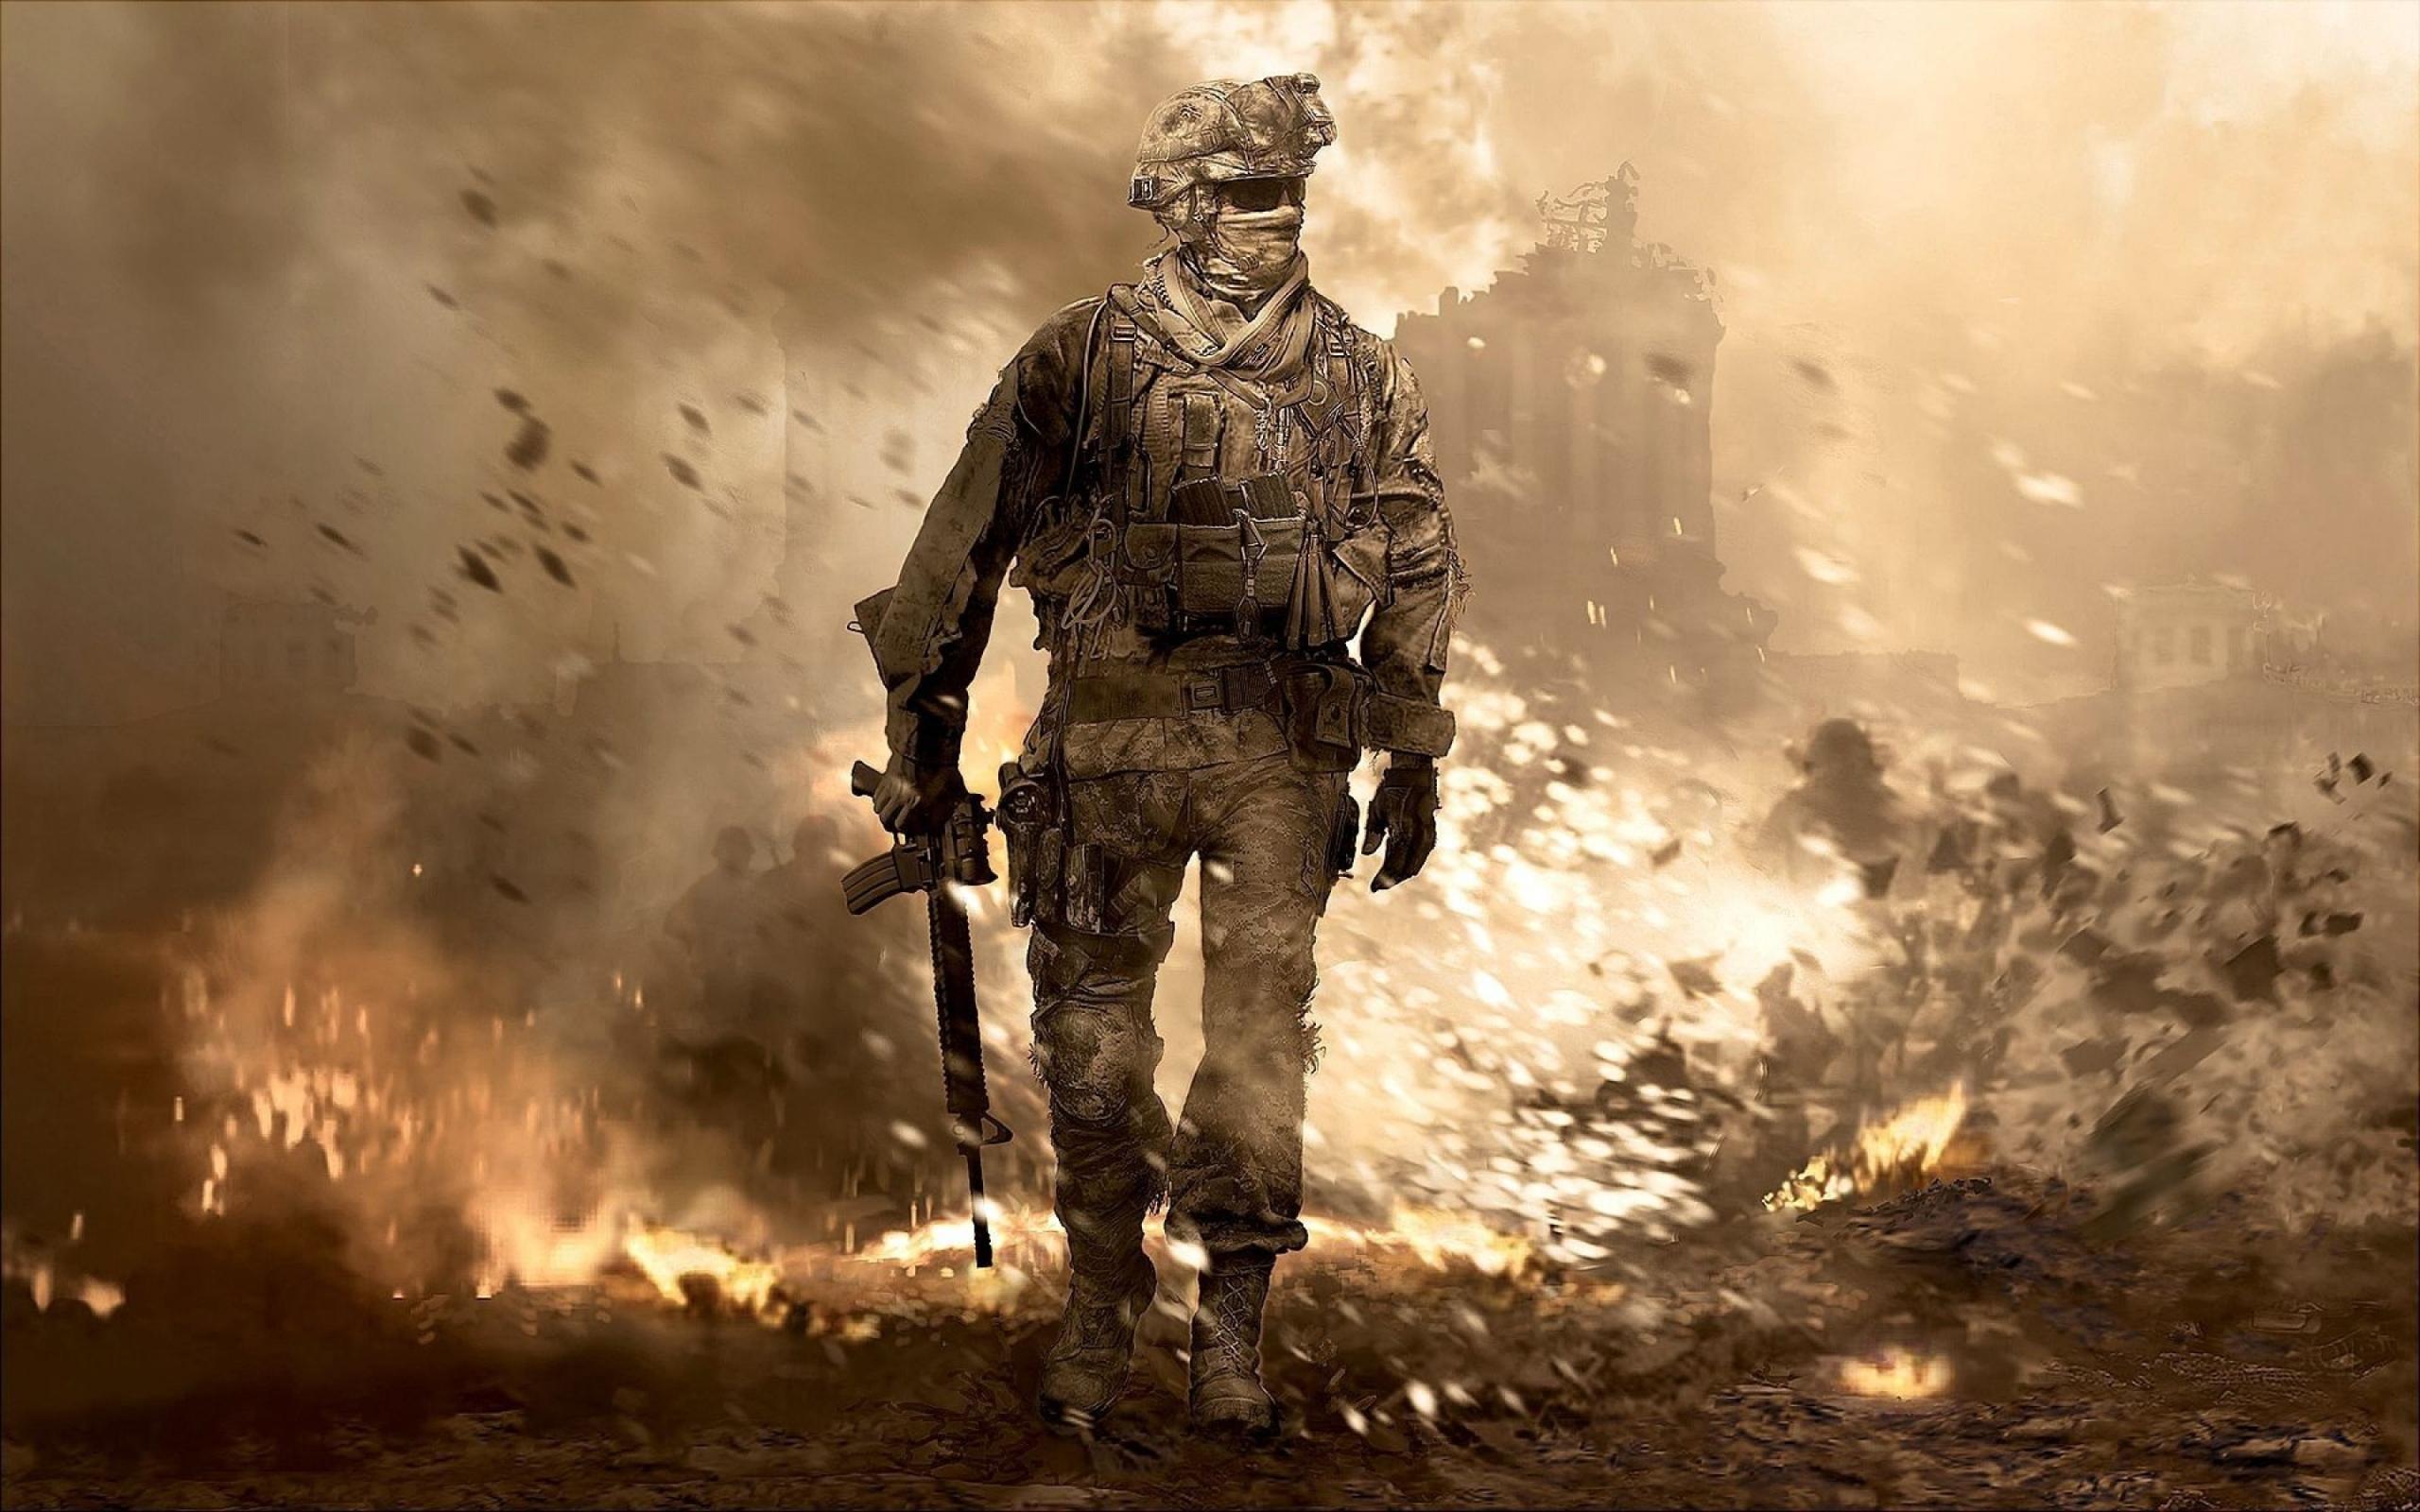 Call of Duty обои для рабочего стола ...: www.rabstol.net/oboi/call_of_duty/2464-call-of-duty.html